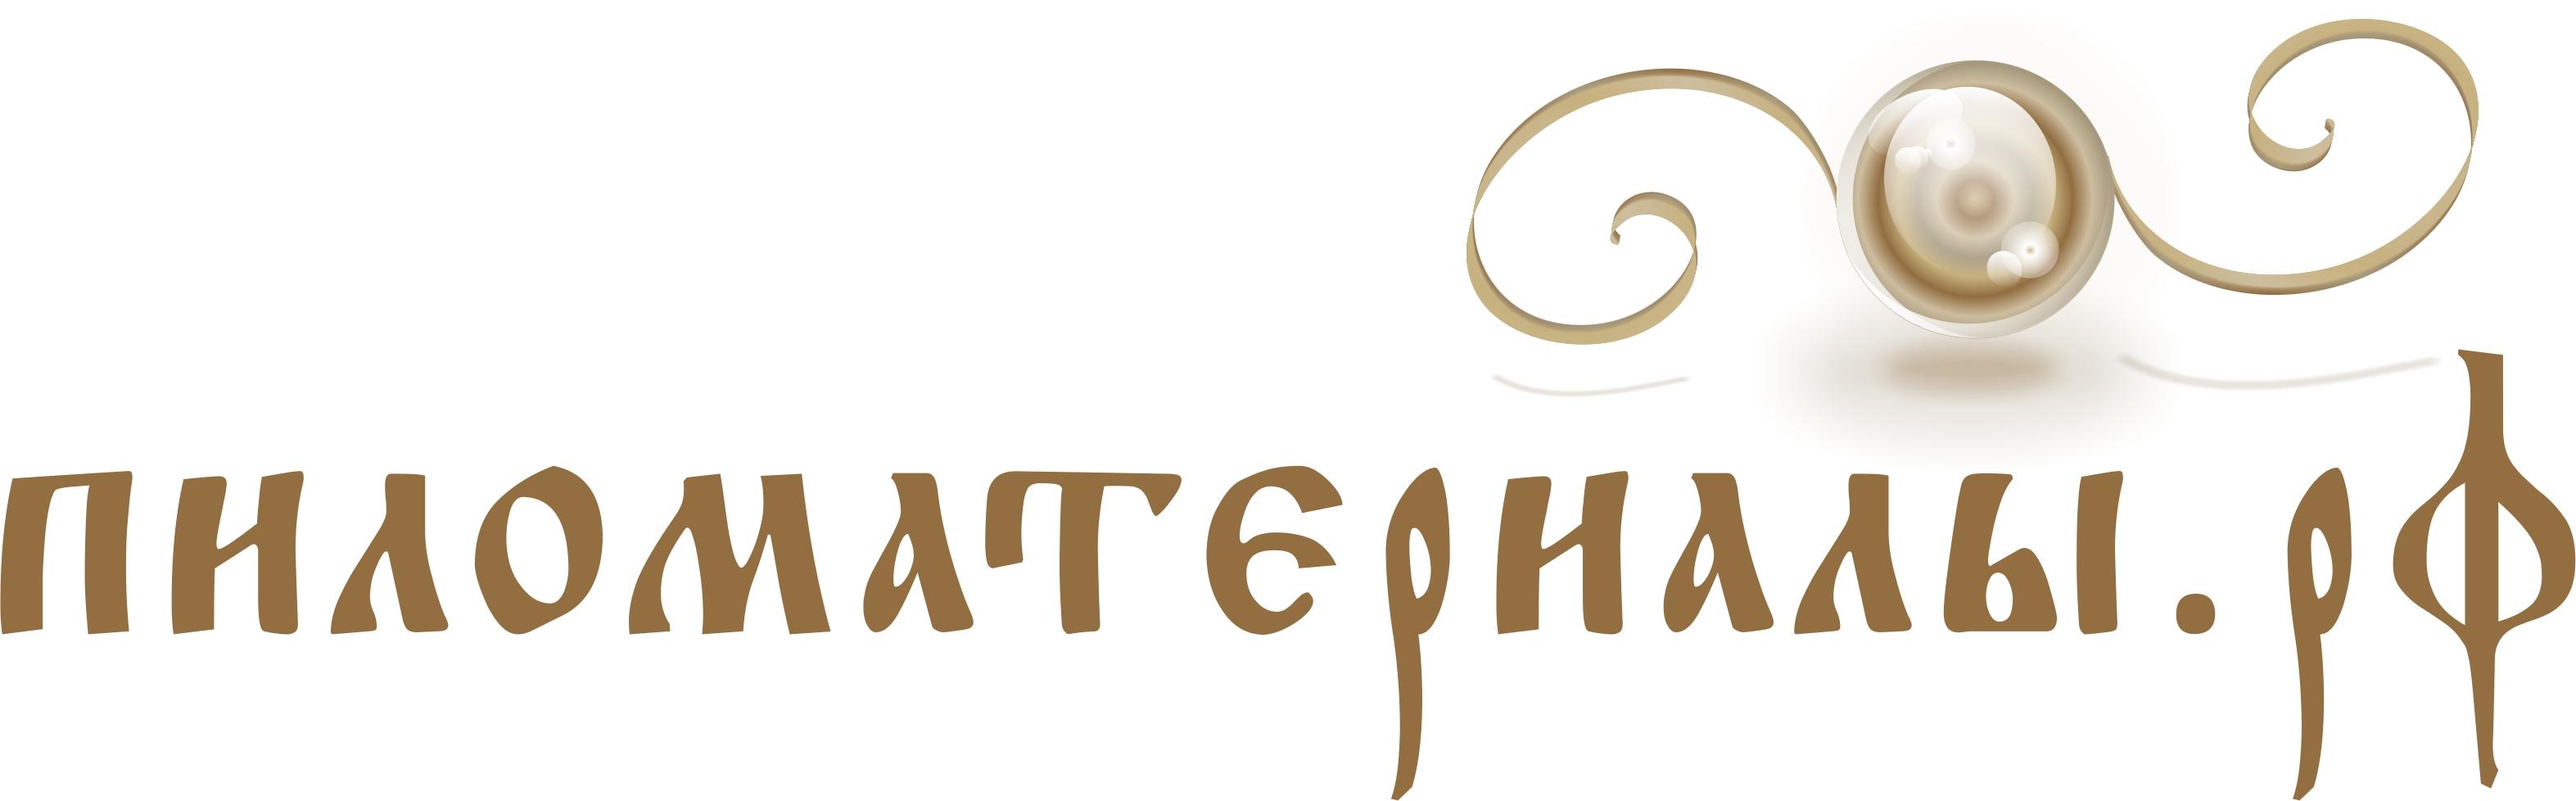 "Создание логотипа и фирменного стиля ""Пиломатериалы.РФ"" фото f_965530f005bbddbc.jpg"